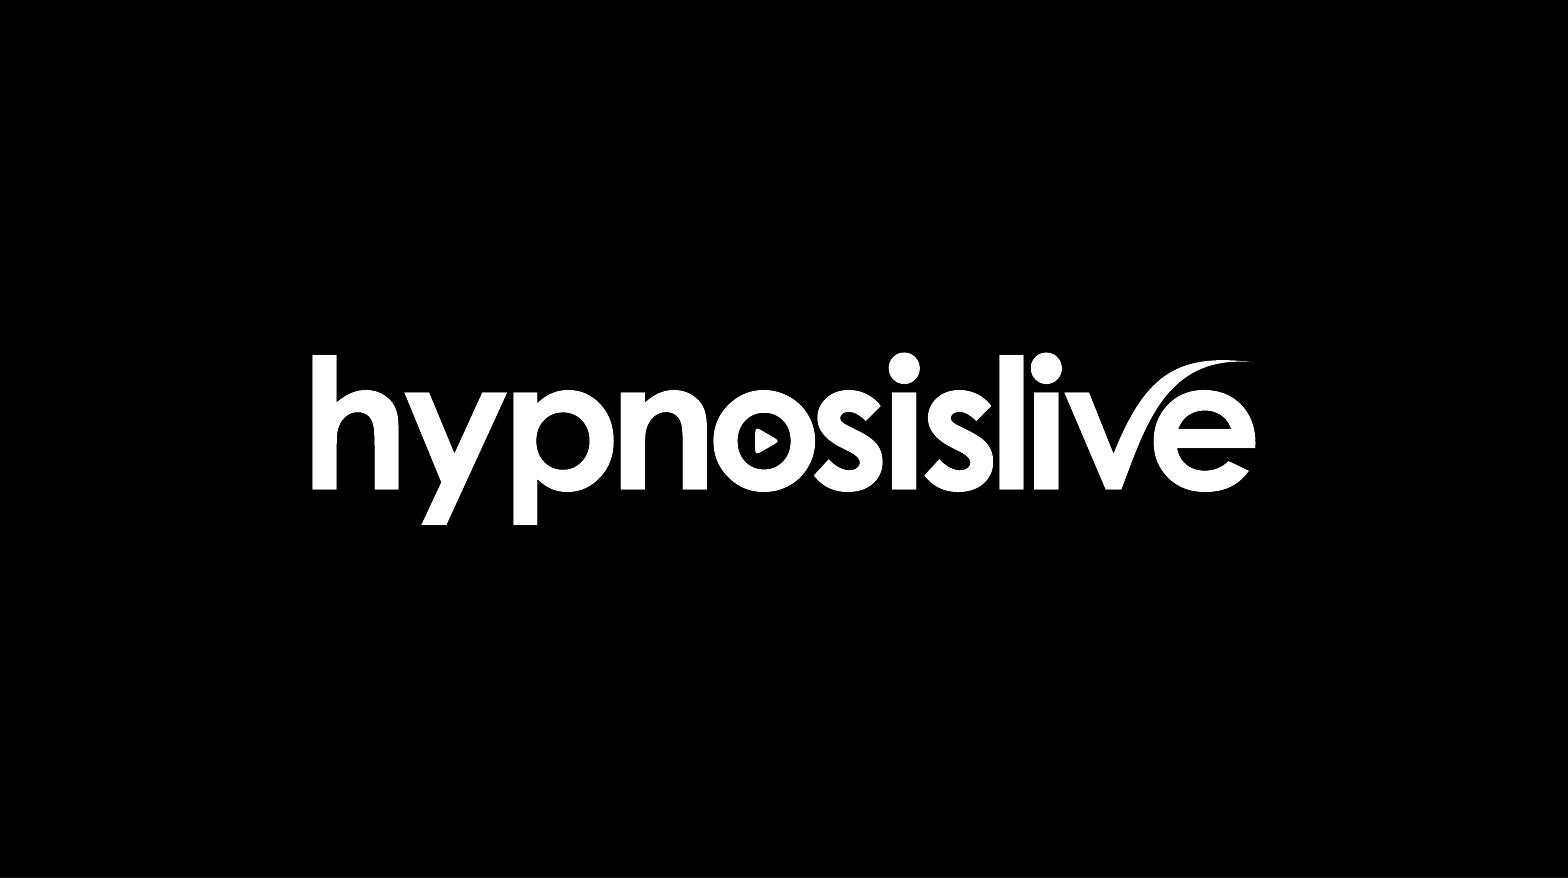 Hypnosis Live - Logo 4